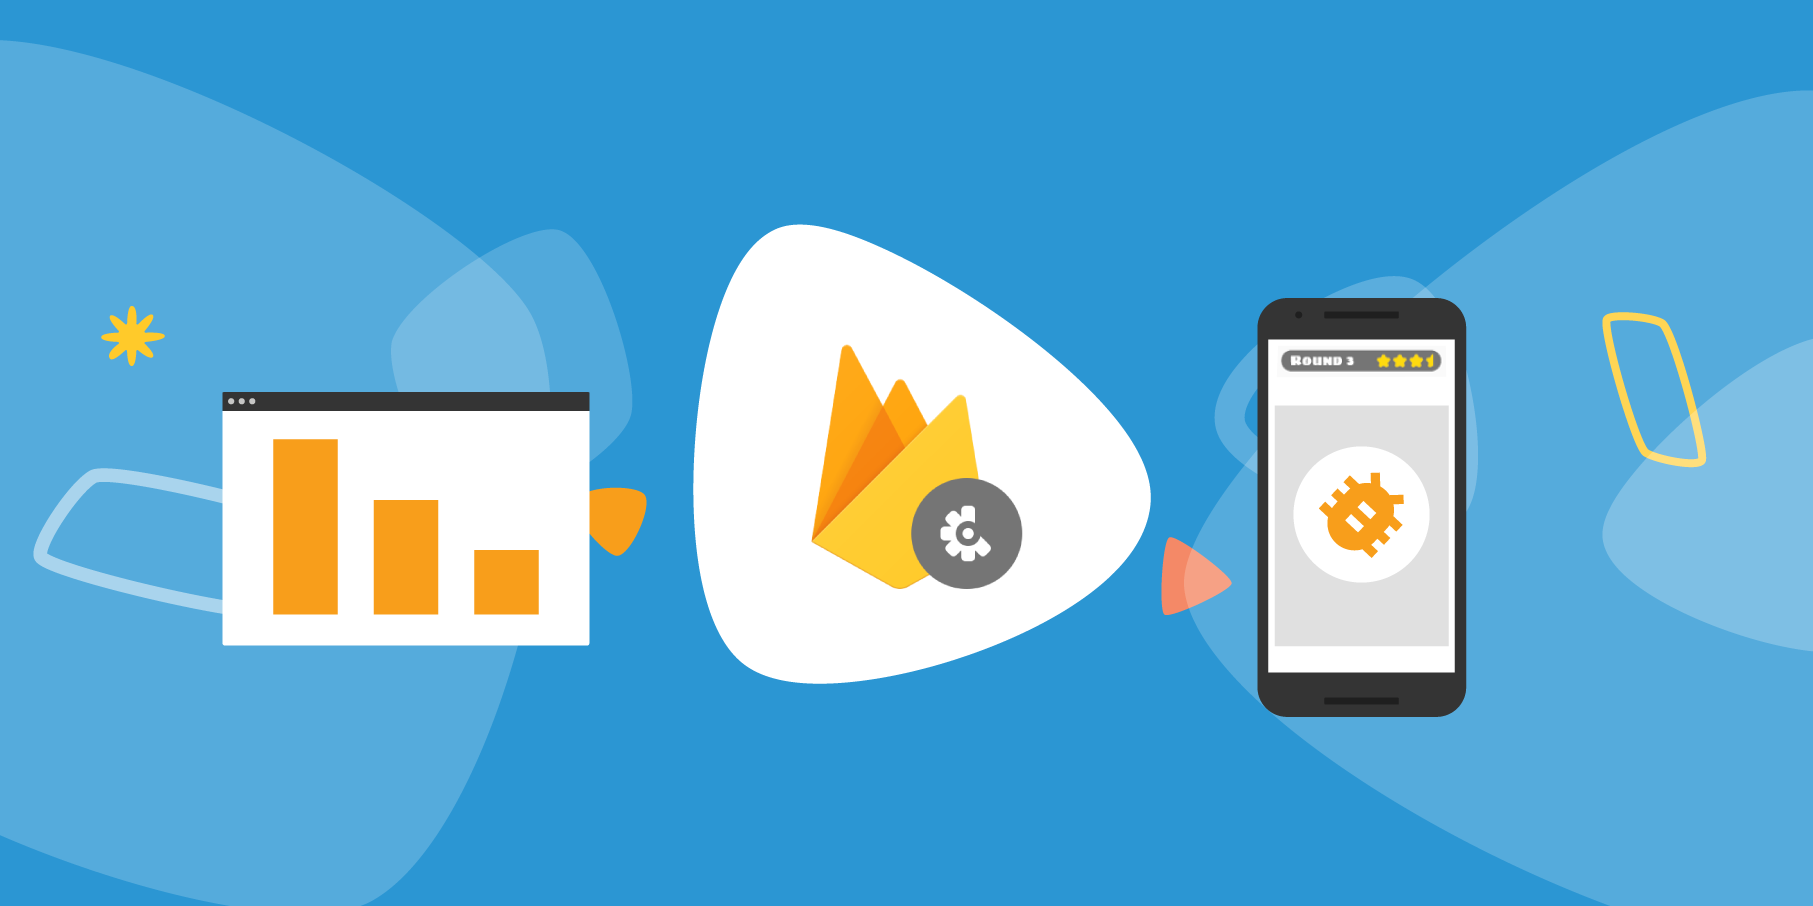 It's Time to Upgrade to the New Firebase Crashlytics SDK!